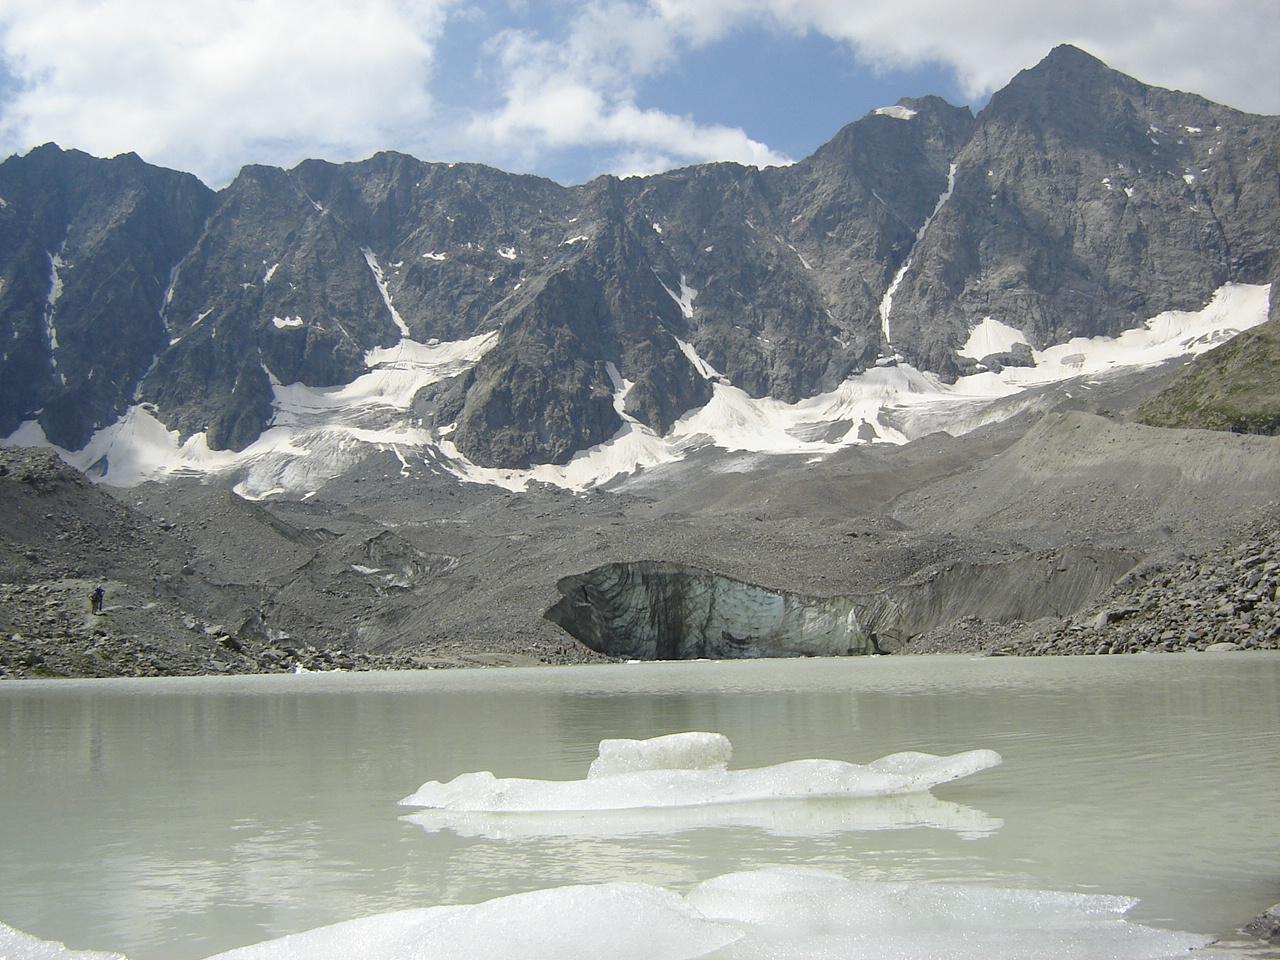 https://upload.wikimedia.org/wikipedia/commons/8/88/Lac_et_glacier_d%27Arsine_%28Ecrins%29.JPG